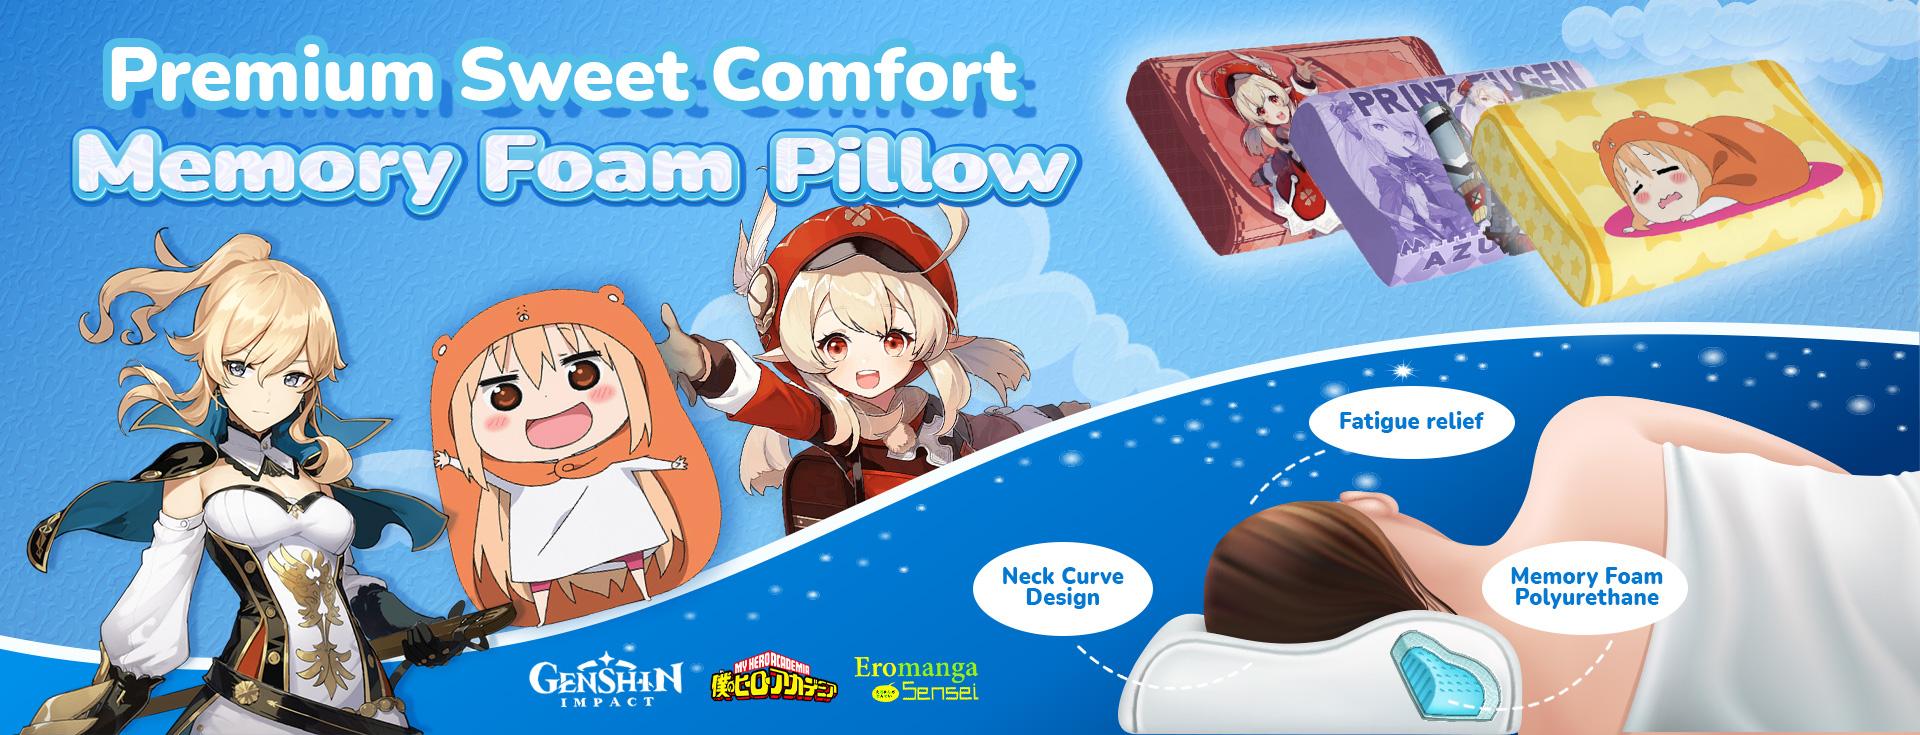 memory-foam-pillow-category-carousel.jpg